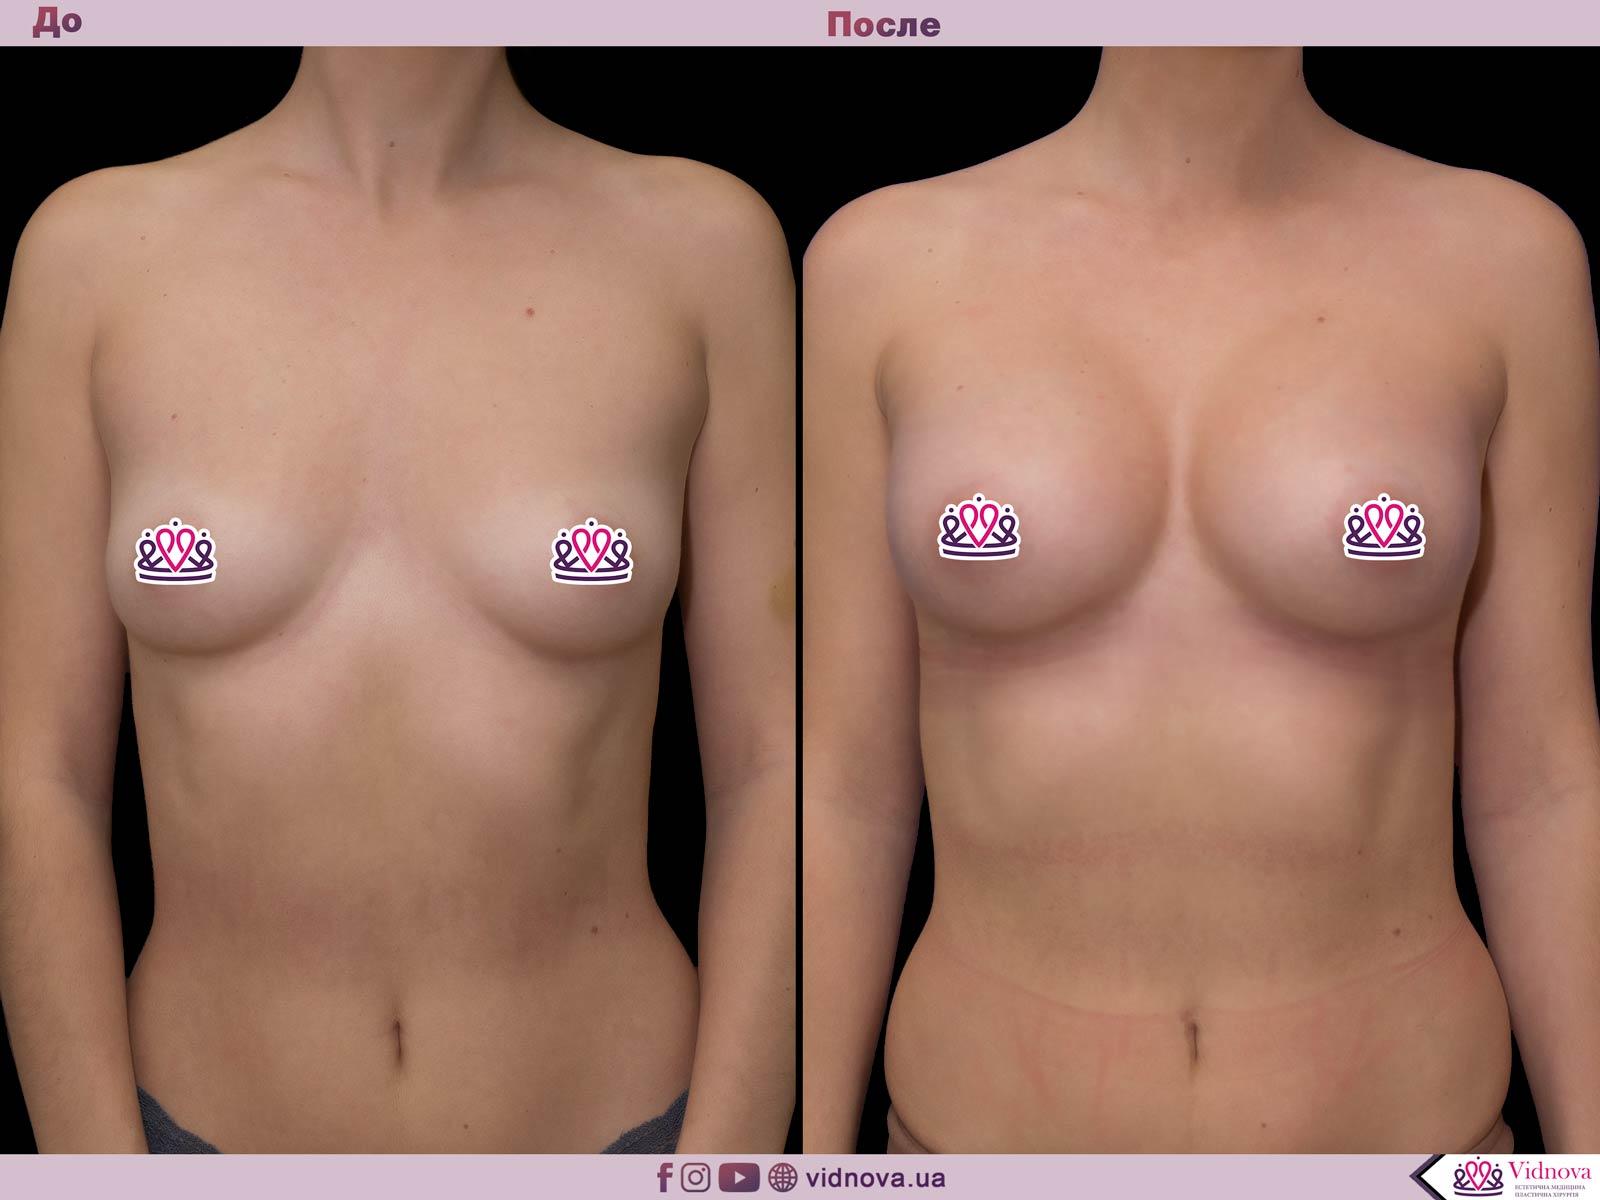 Увеличение груди: Фото ДО и ПОСЛЕ - Пример №40-1 - Клиника Vidnova